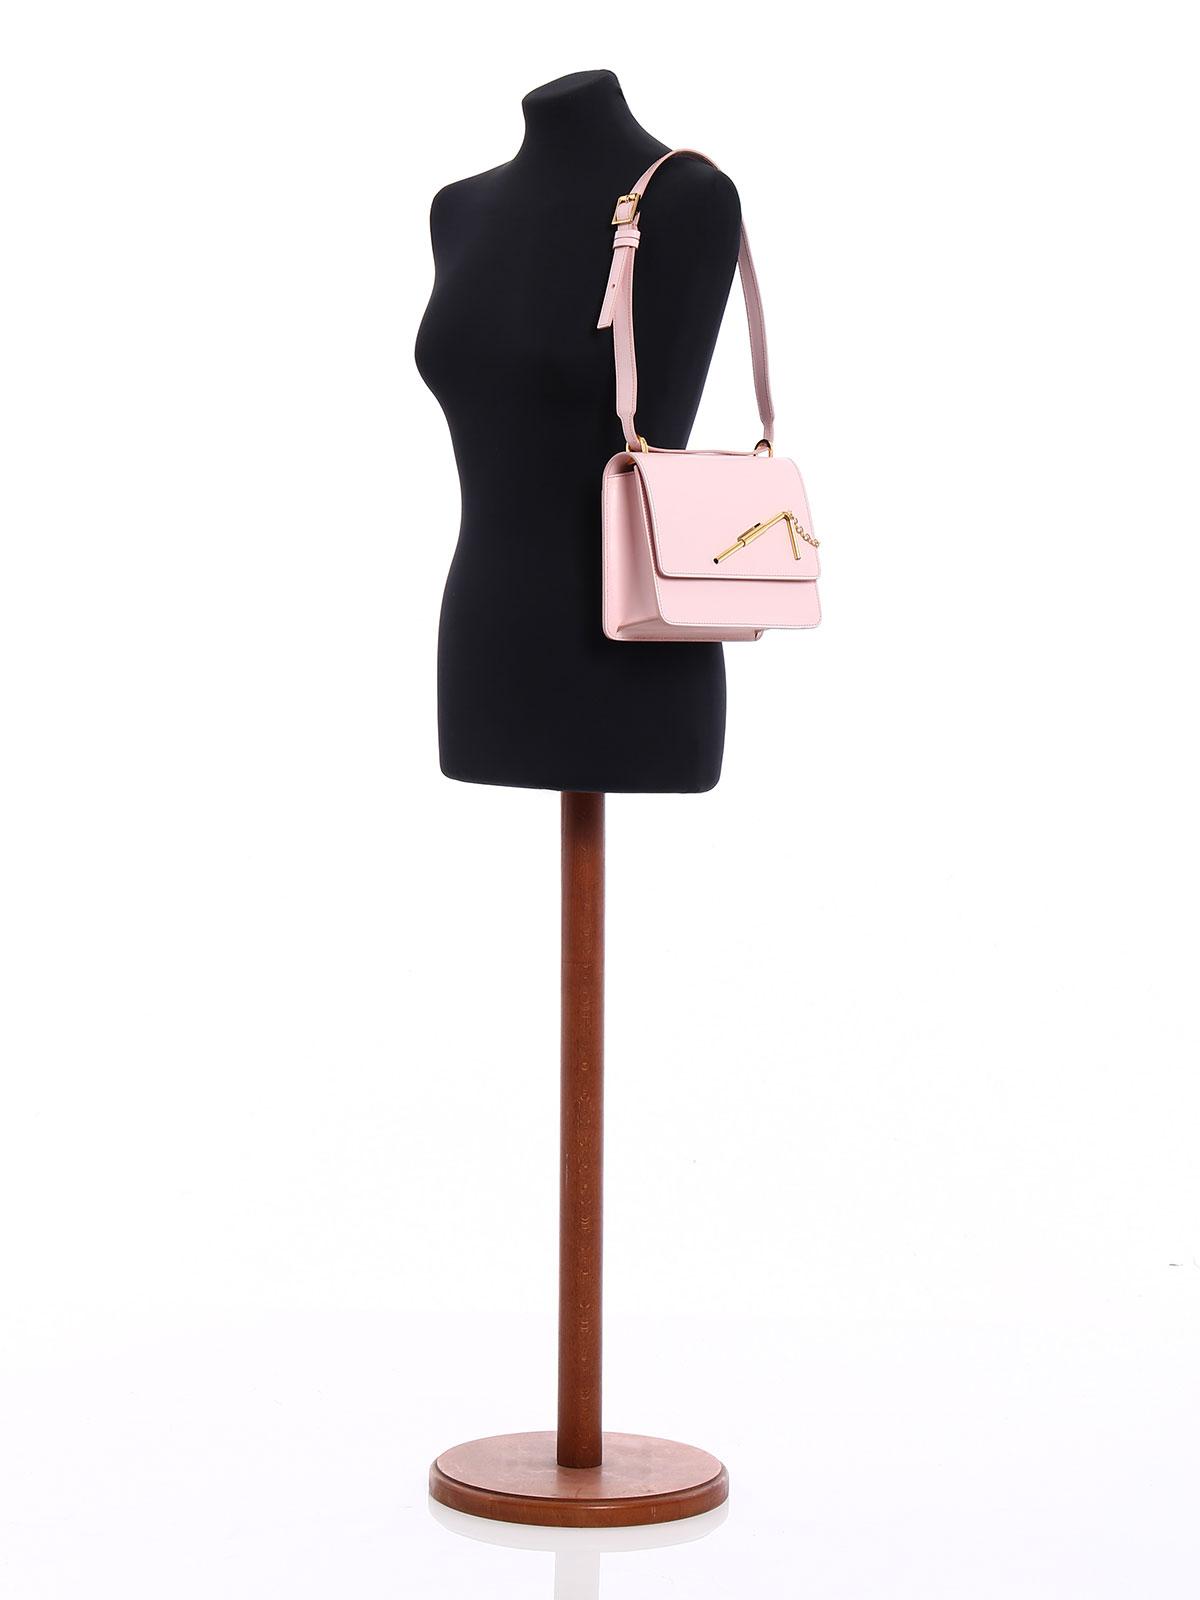 iKRIX Sophie Hulme  Medium Straw leather bag · Sophie Hulme  shoulder bags  ... a5a26c221a9c0